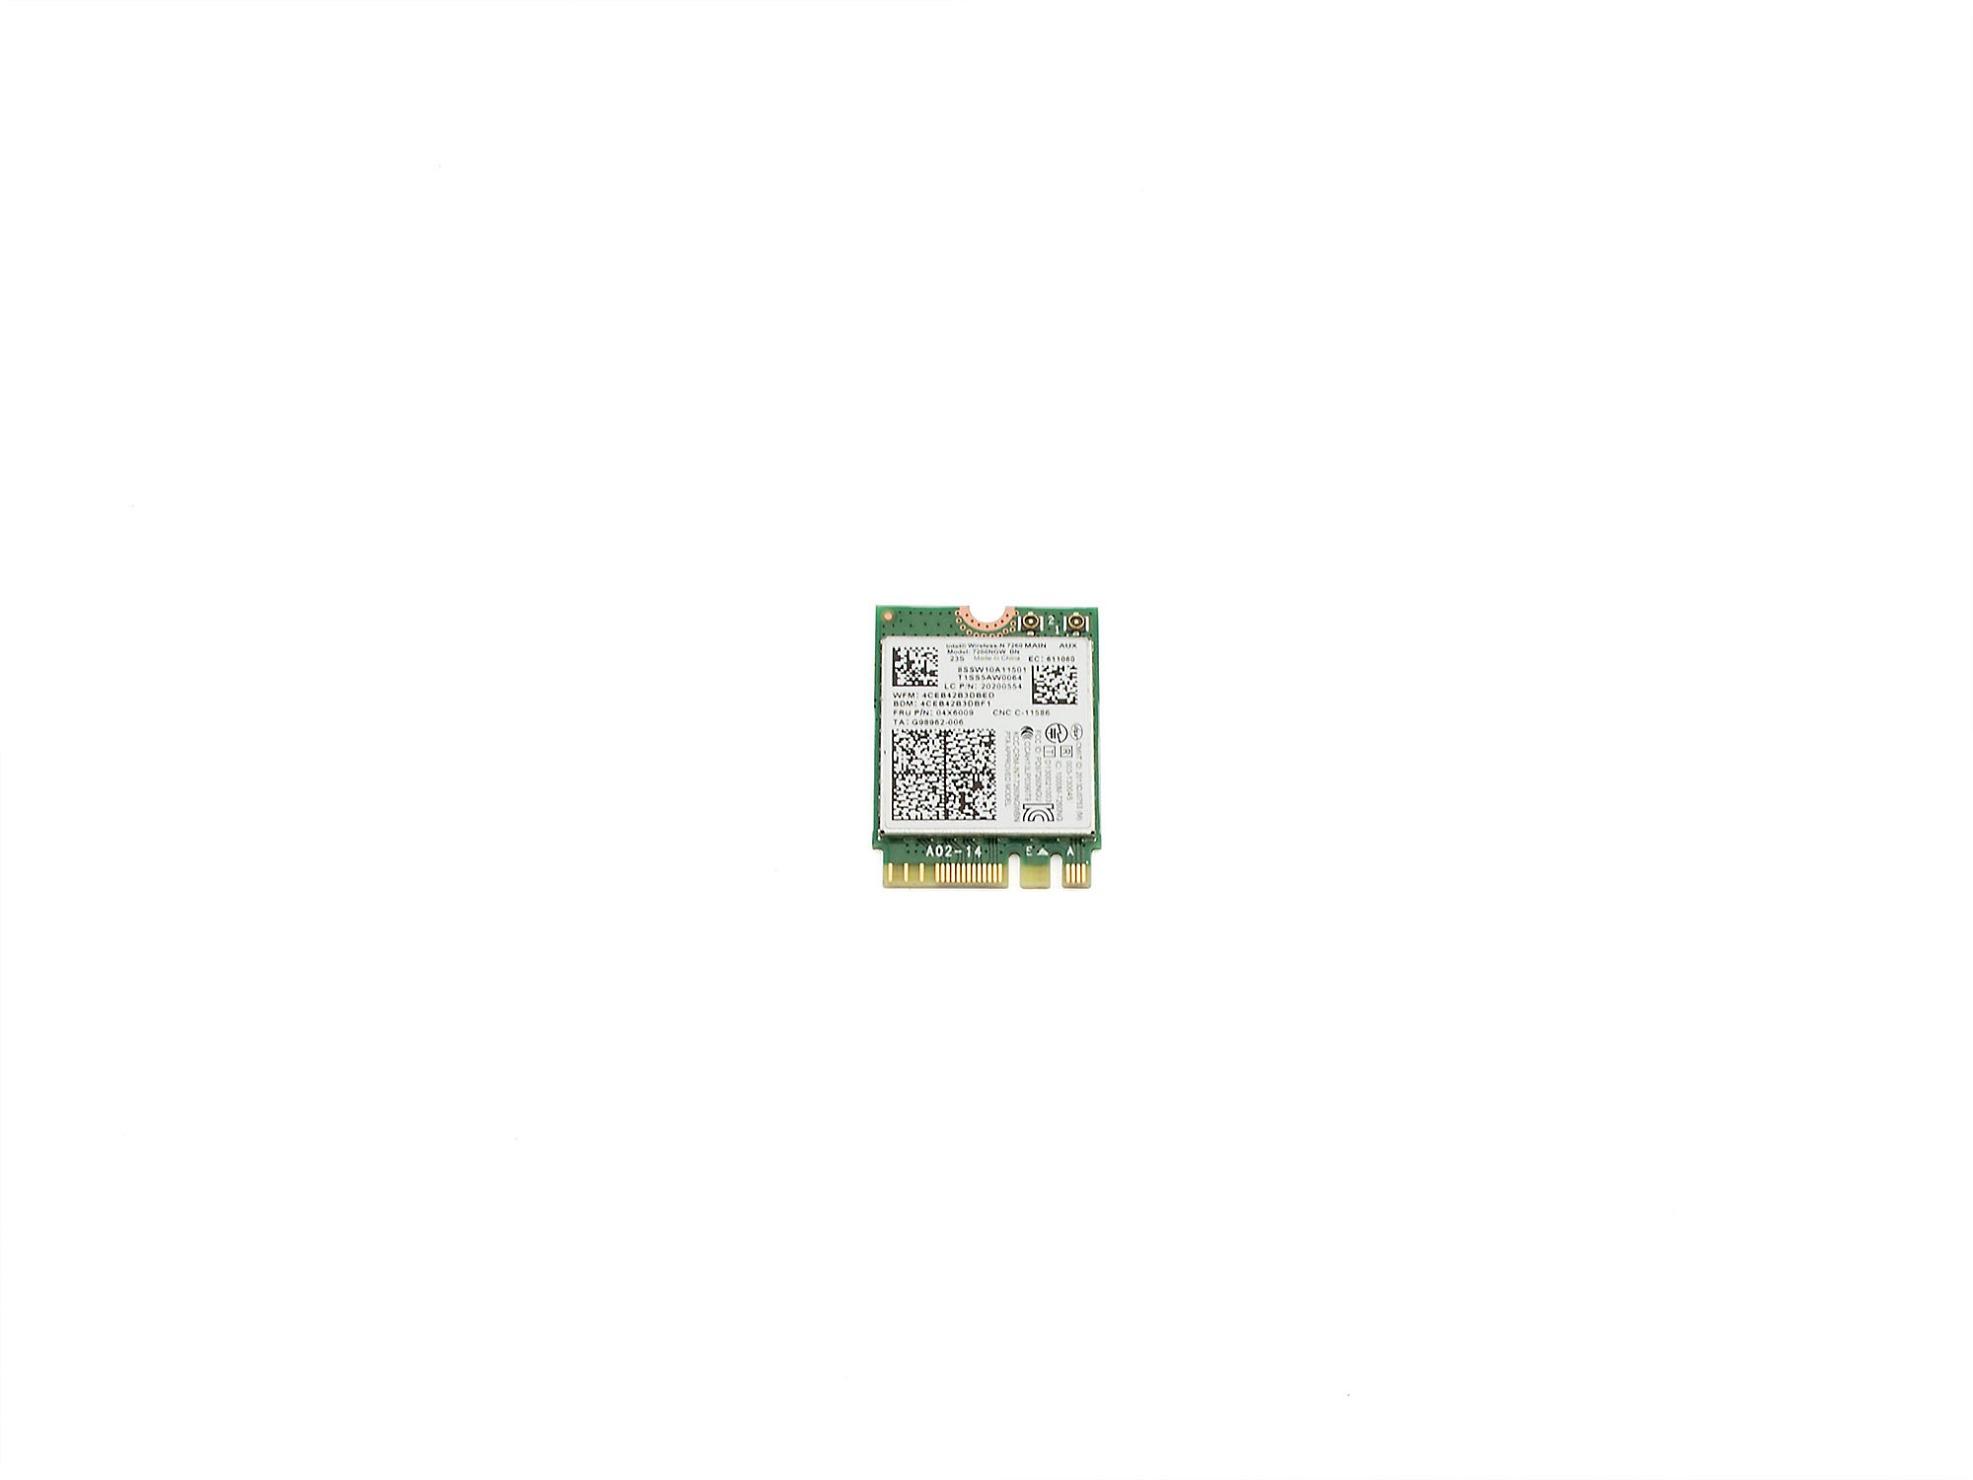 Intel Wireless-N 7260 MAIN für Lenovo ThinkPad X240s Serie